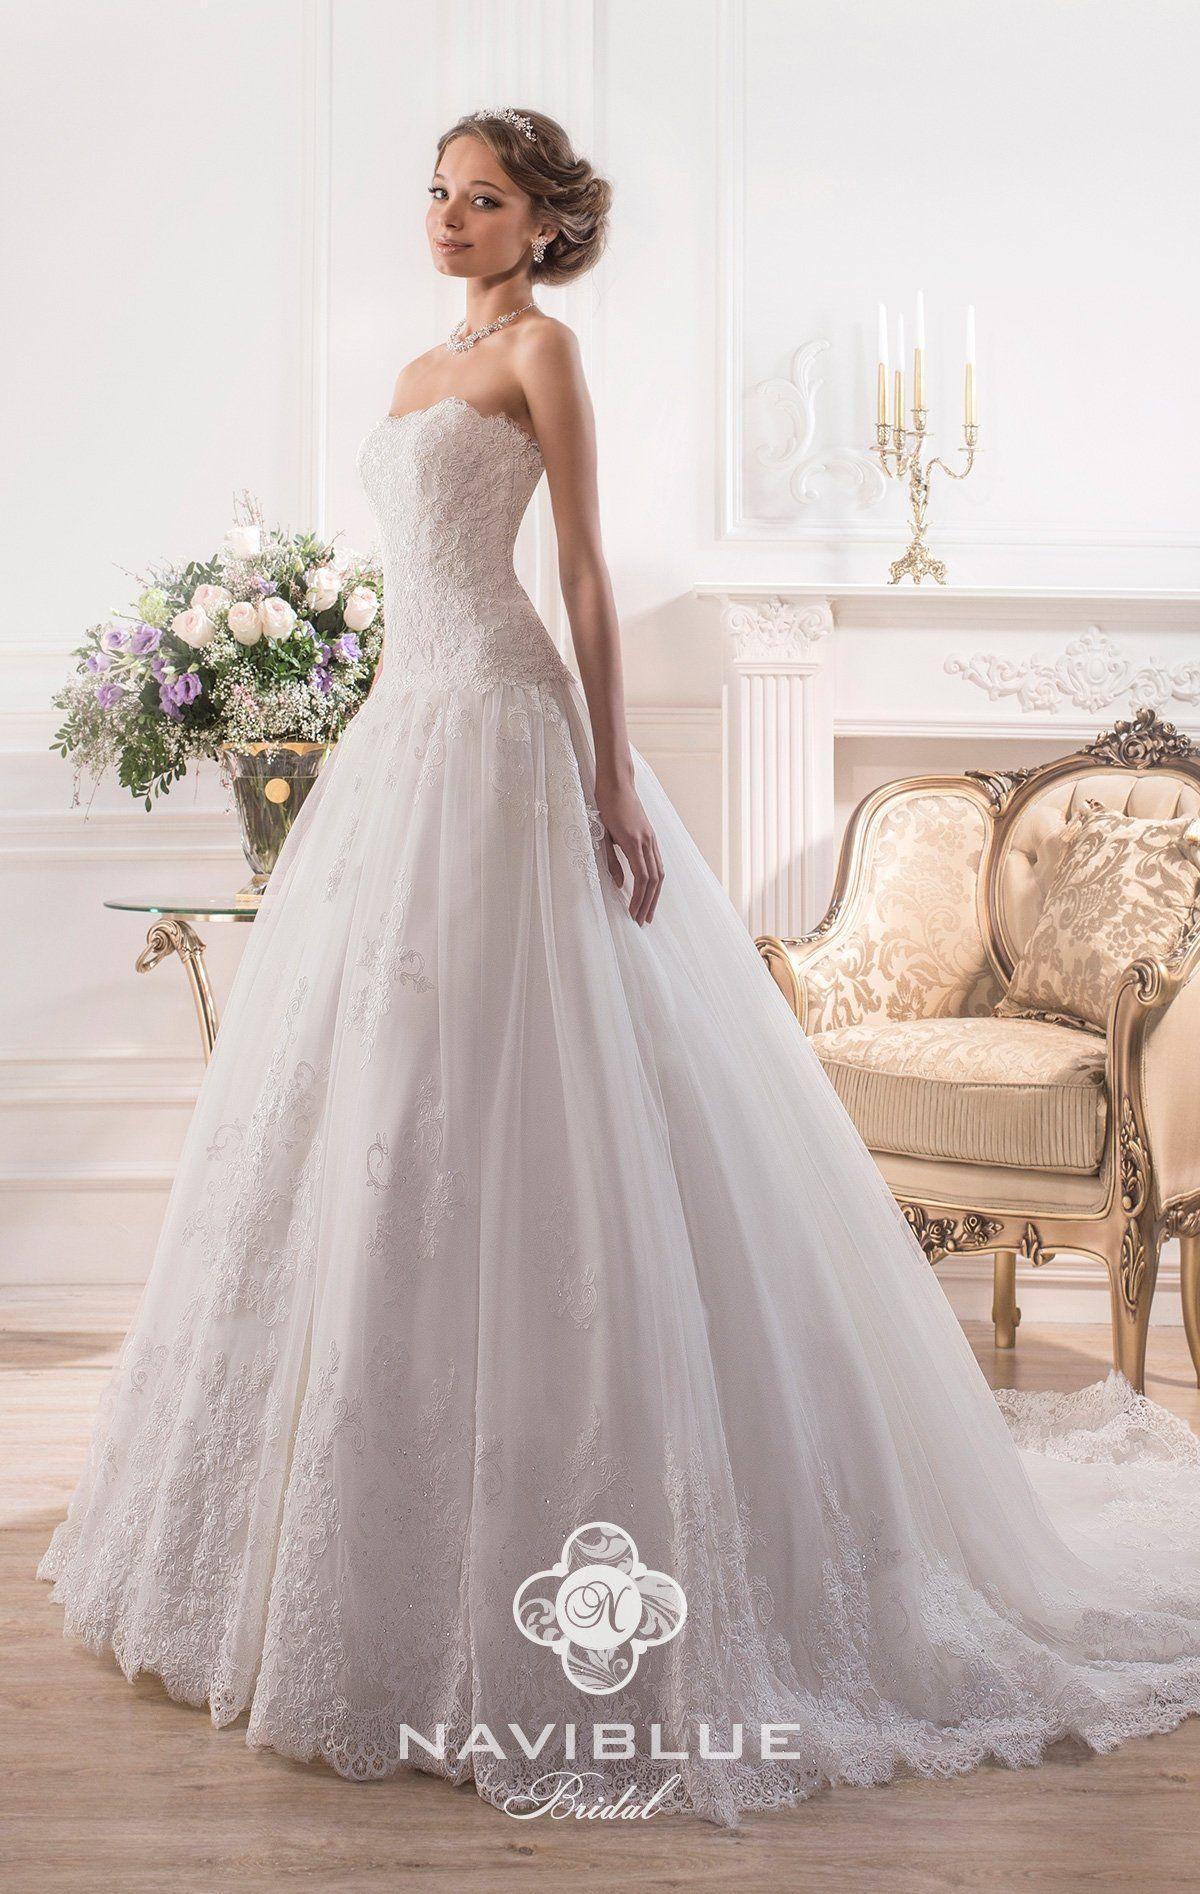 54a0d16e707 Brautmode gera. Brautmode Gera › Hochzeitsmode Braut   Bräutigam ...